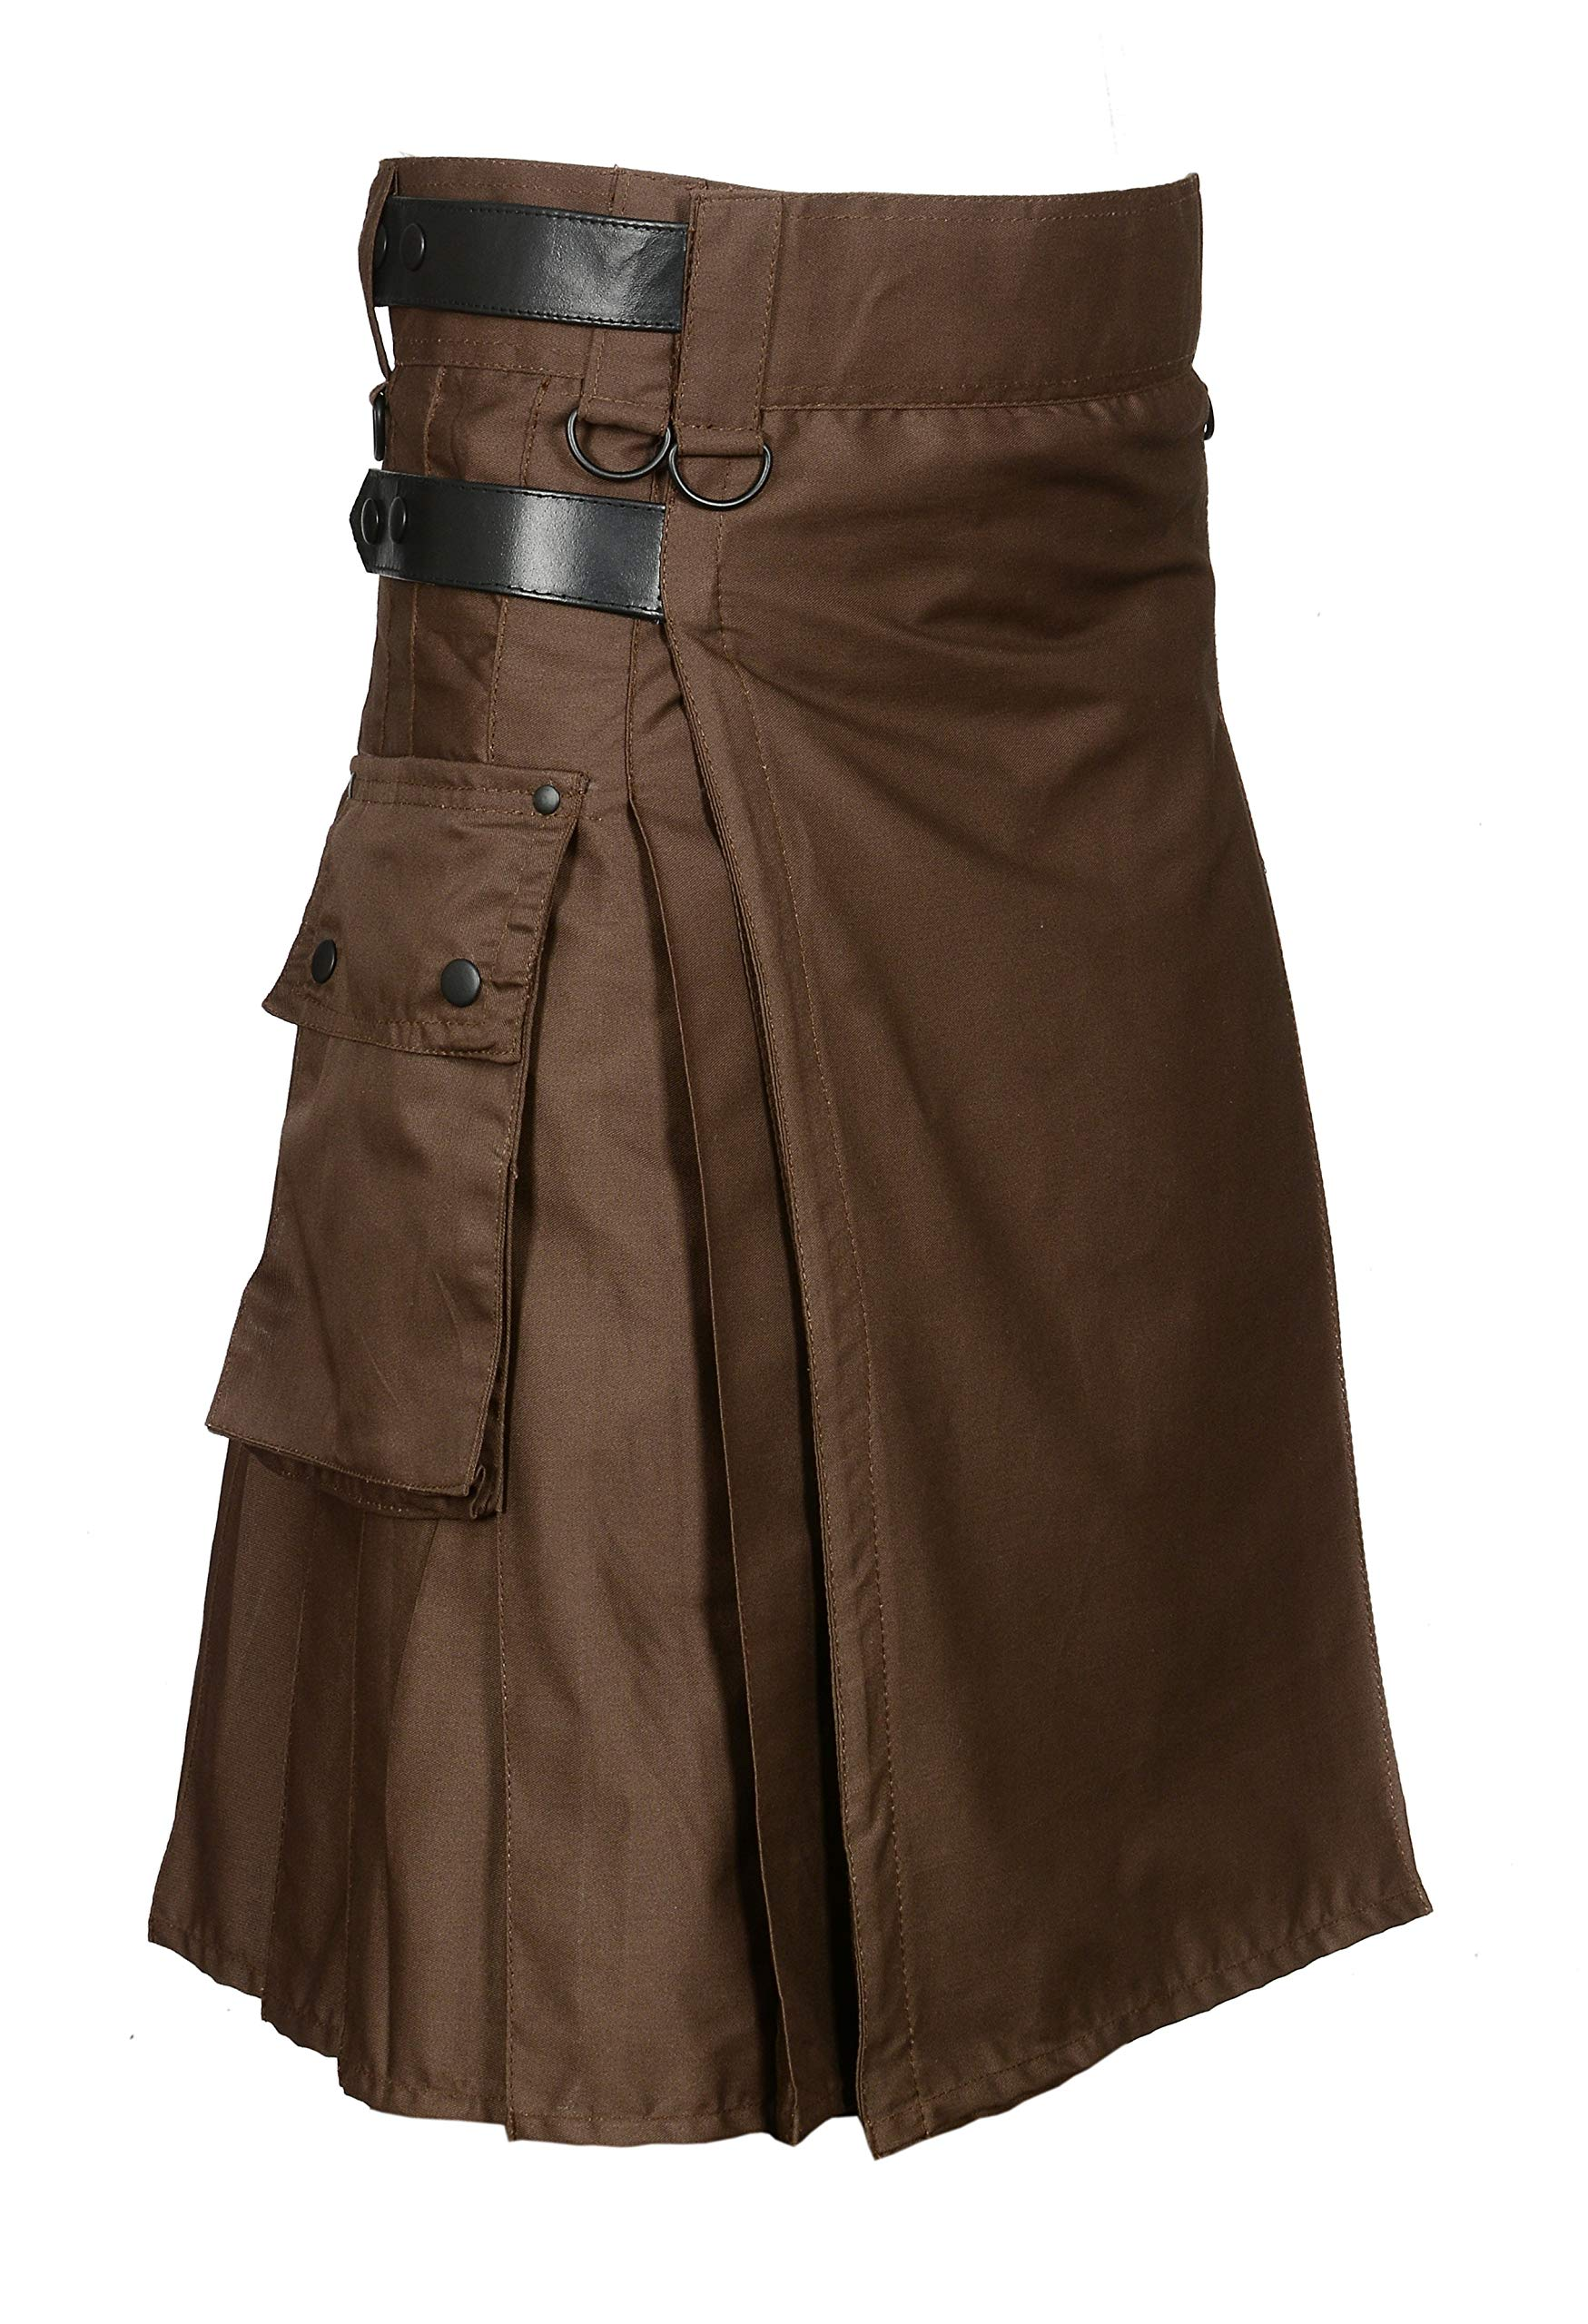 Chocolate Brown Leather Strap Utility Kilt For Active Man Kilt Wedding Kilts (38)